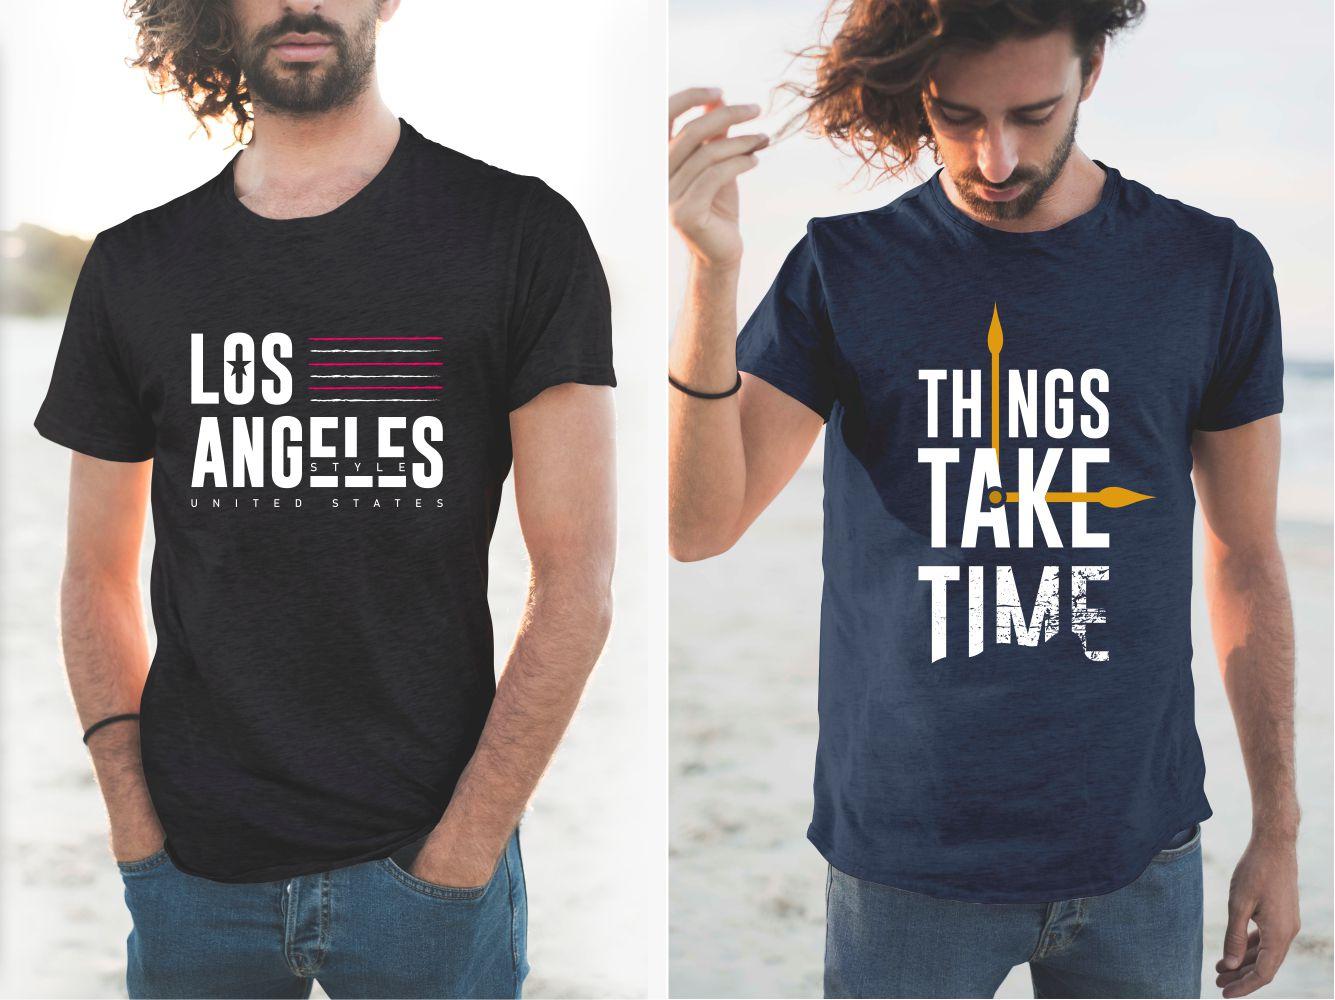 106 Urban T-shirt Designs Collection - 52